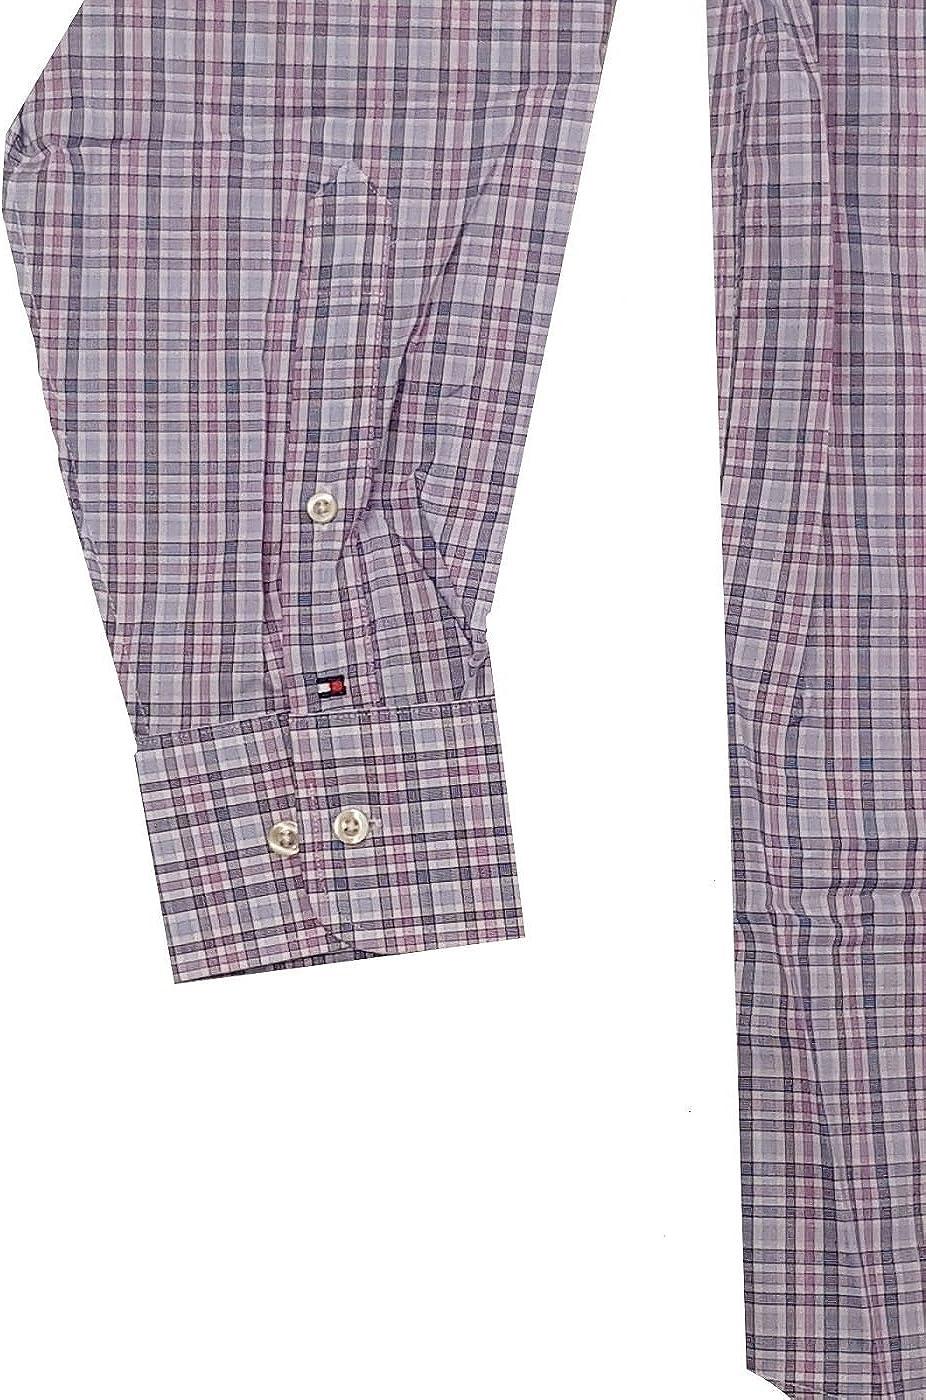 Tommy Hilfiger Mens Regular Fit Spread Collar Long Sleeve Dress Shirt